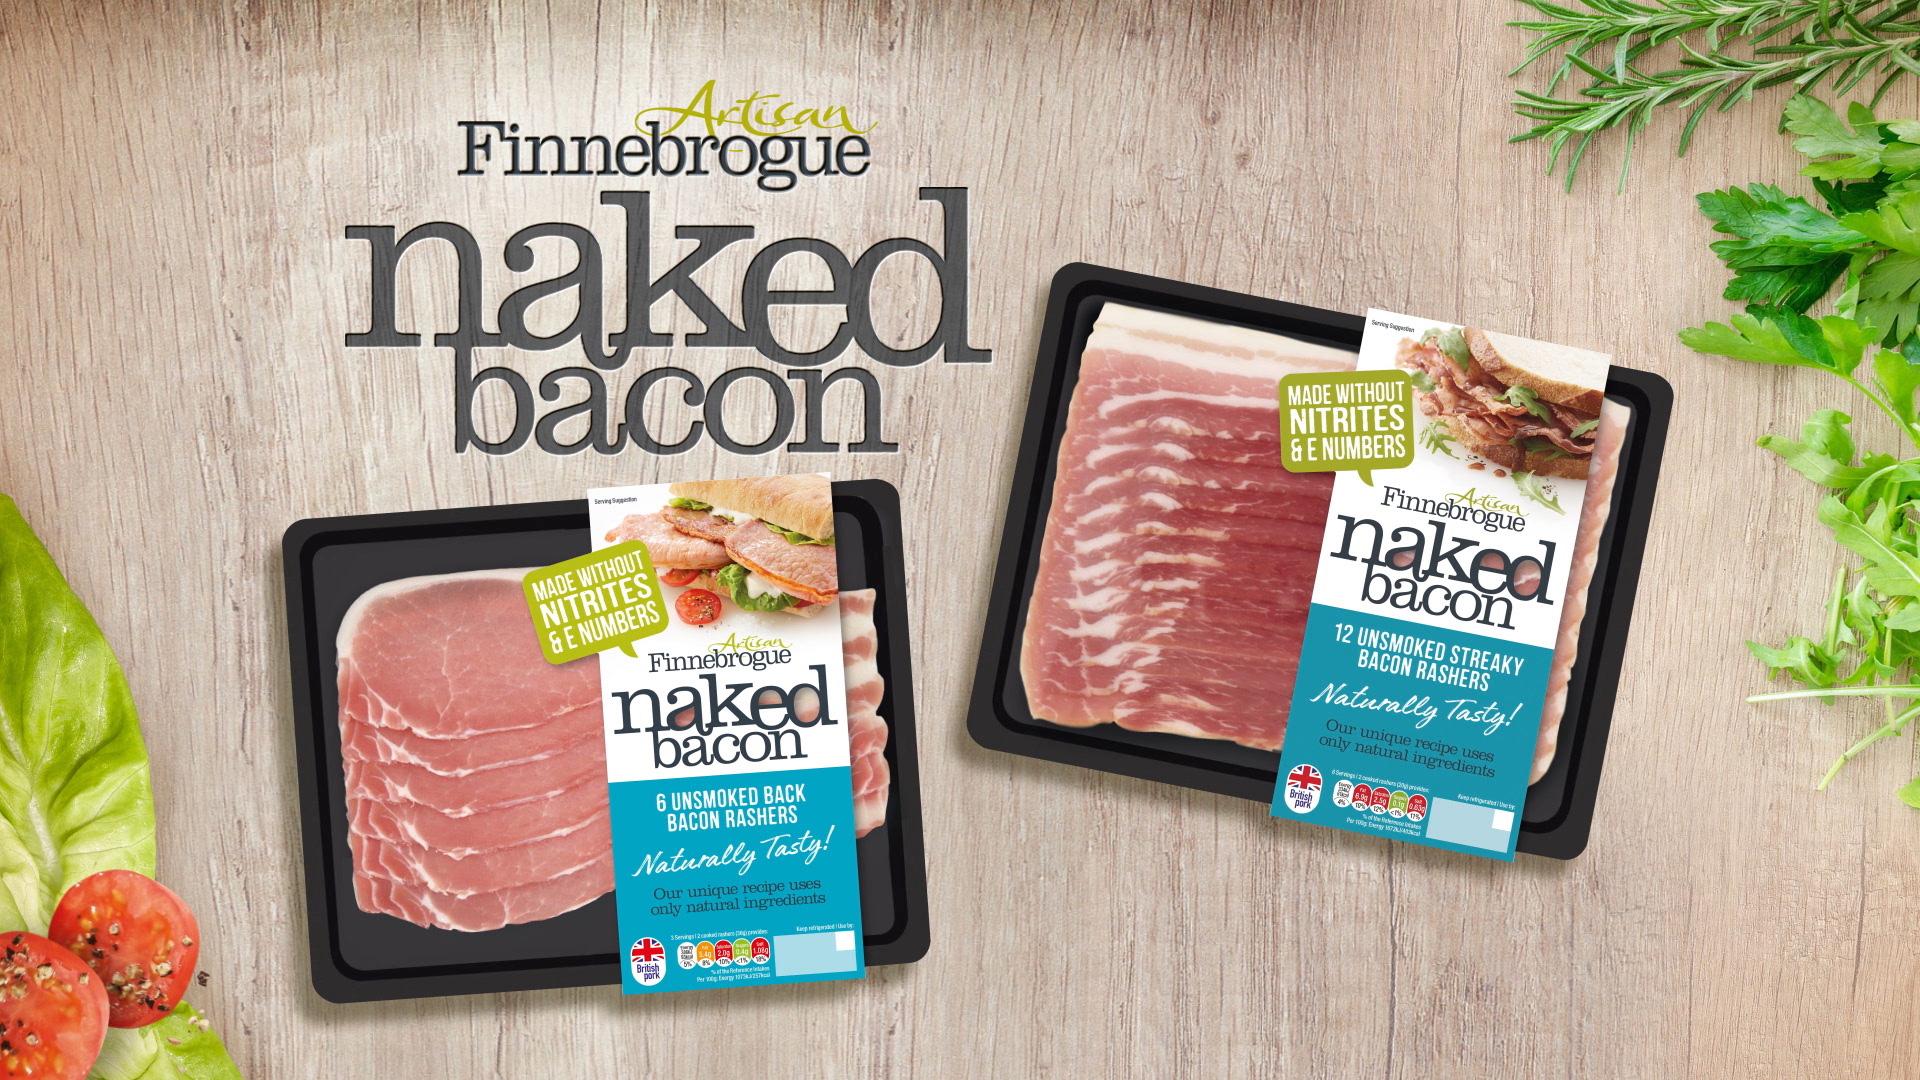 Naked_bacon_Finnebrogue_Artisan.jpg